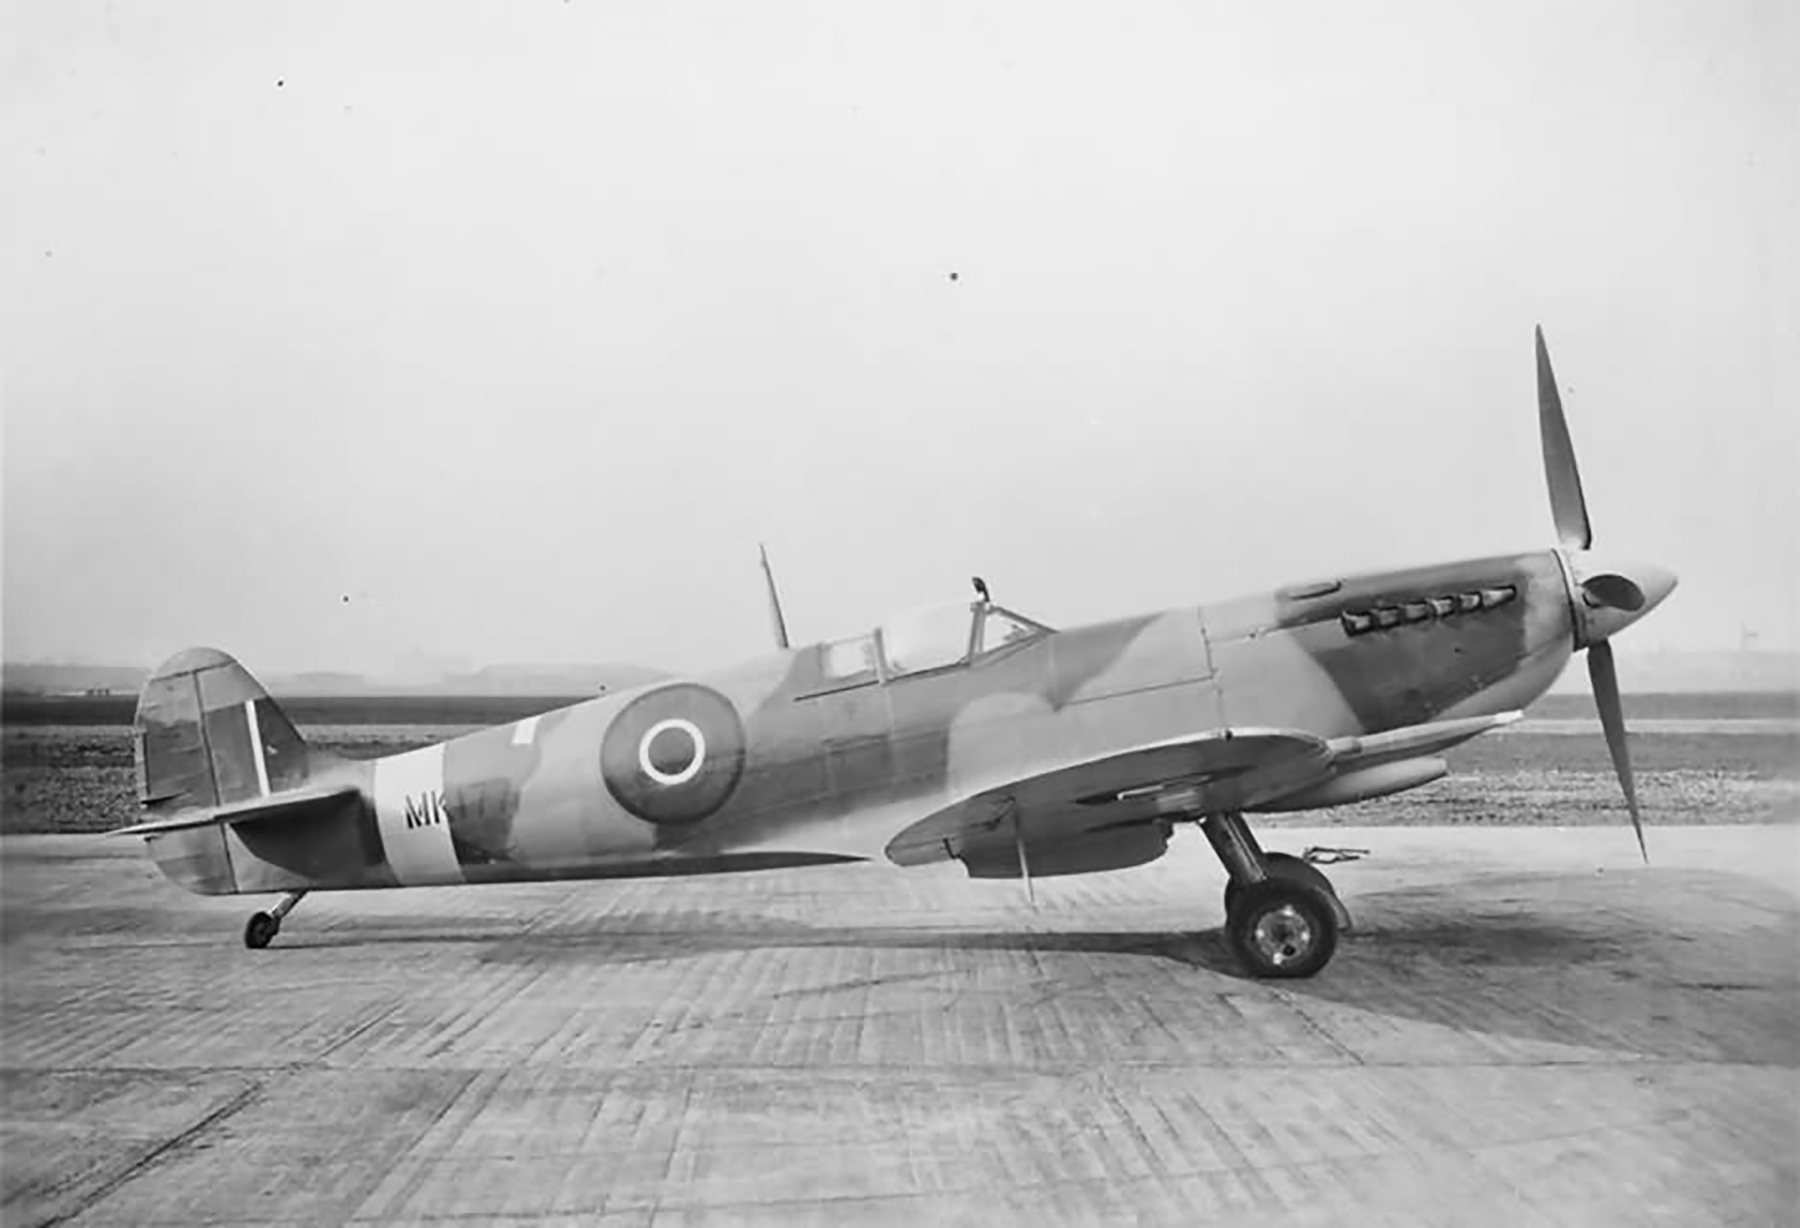 Factory fresh Spitfire LFIX RAF MK177 Castle Bromwich England web 02